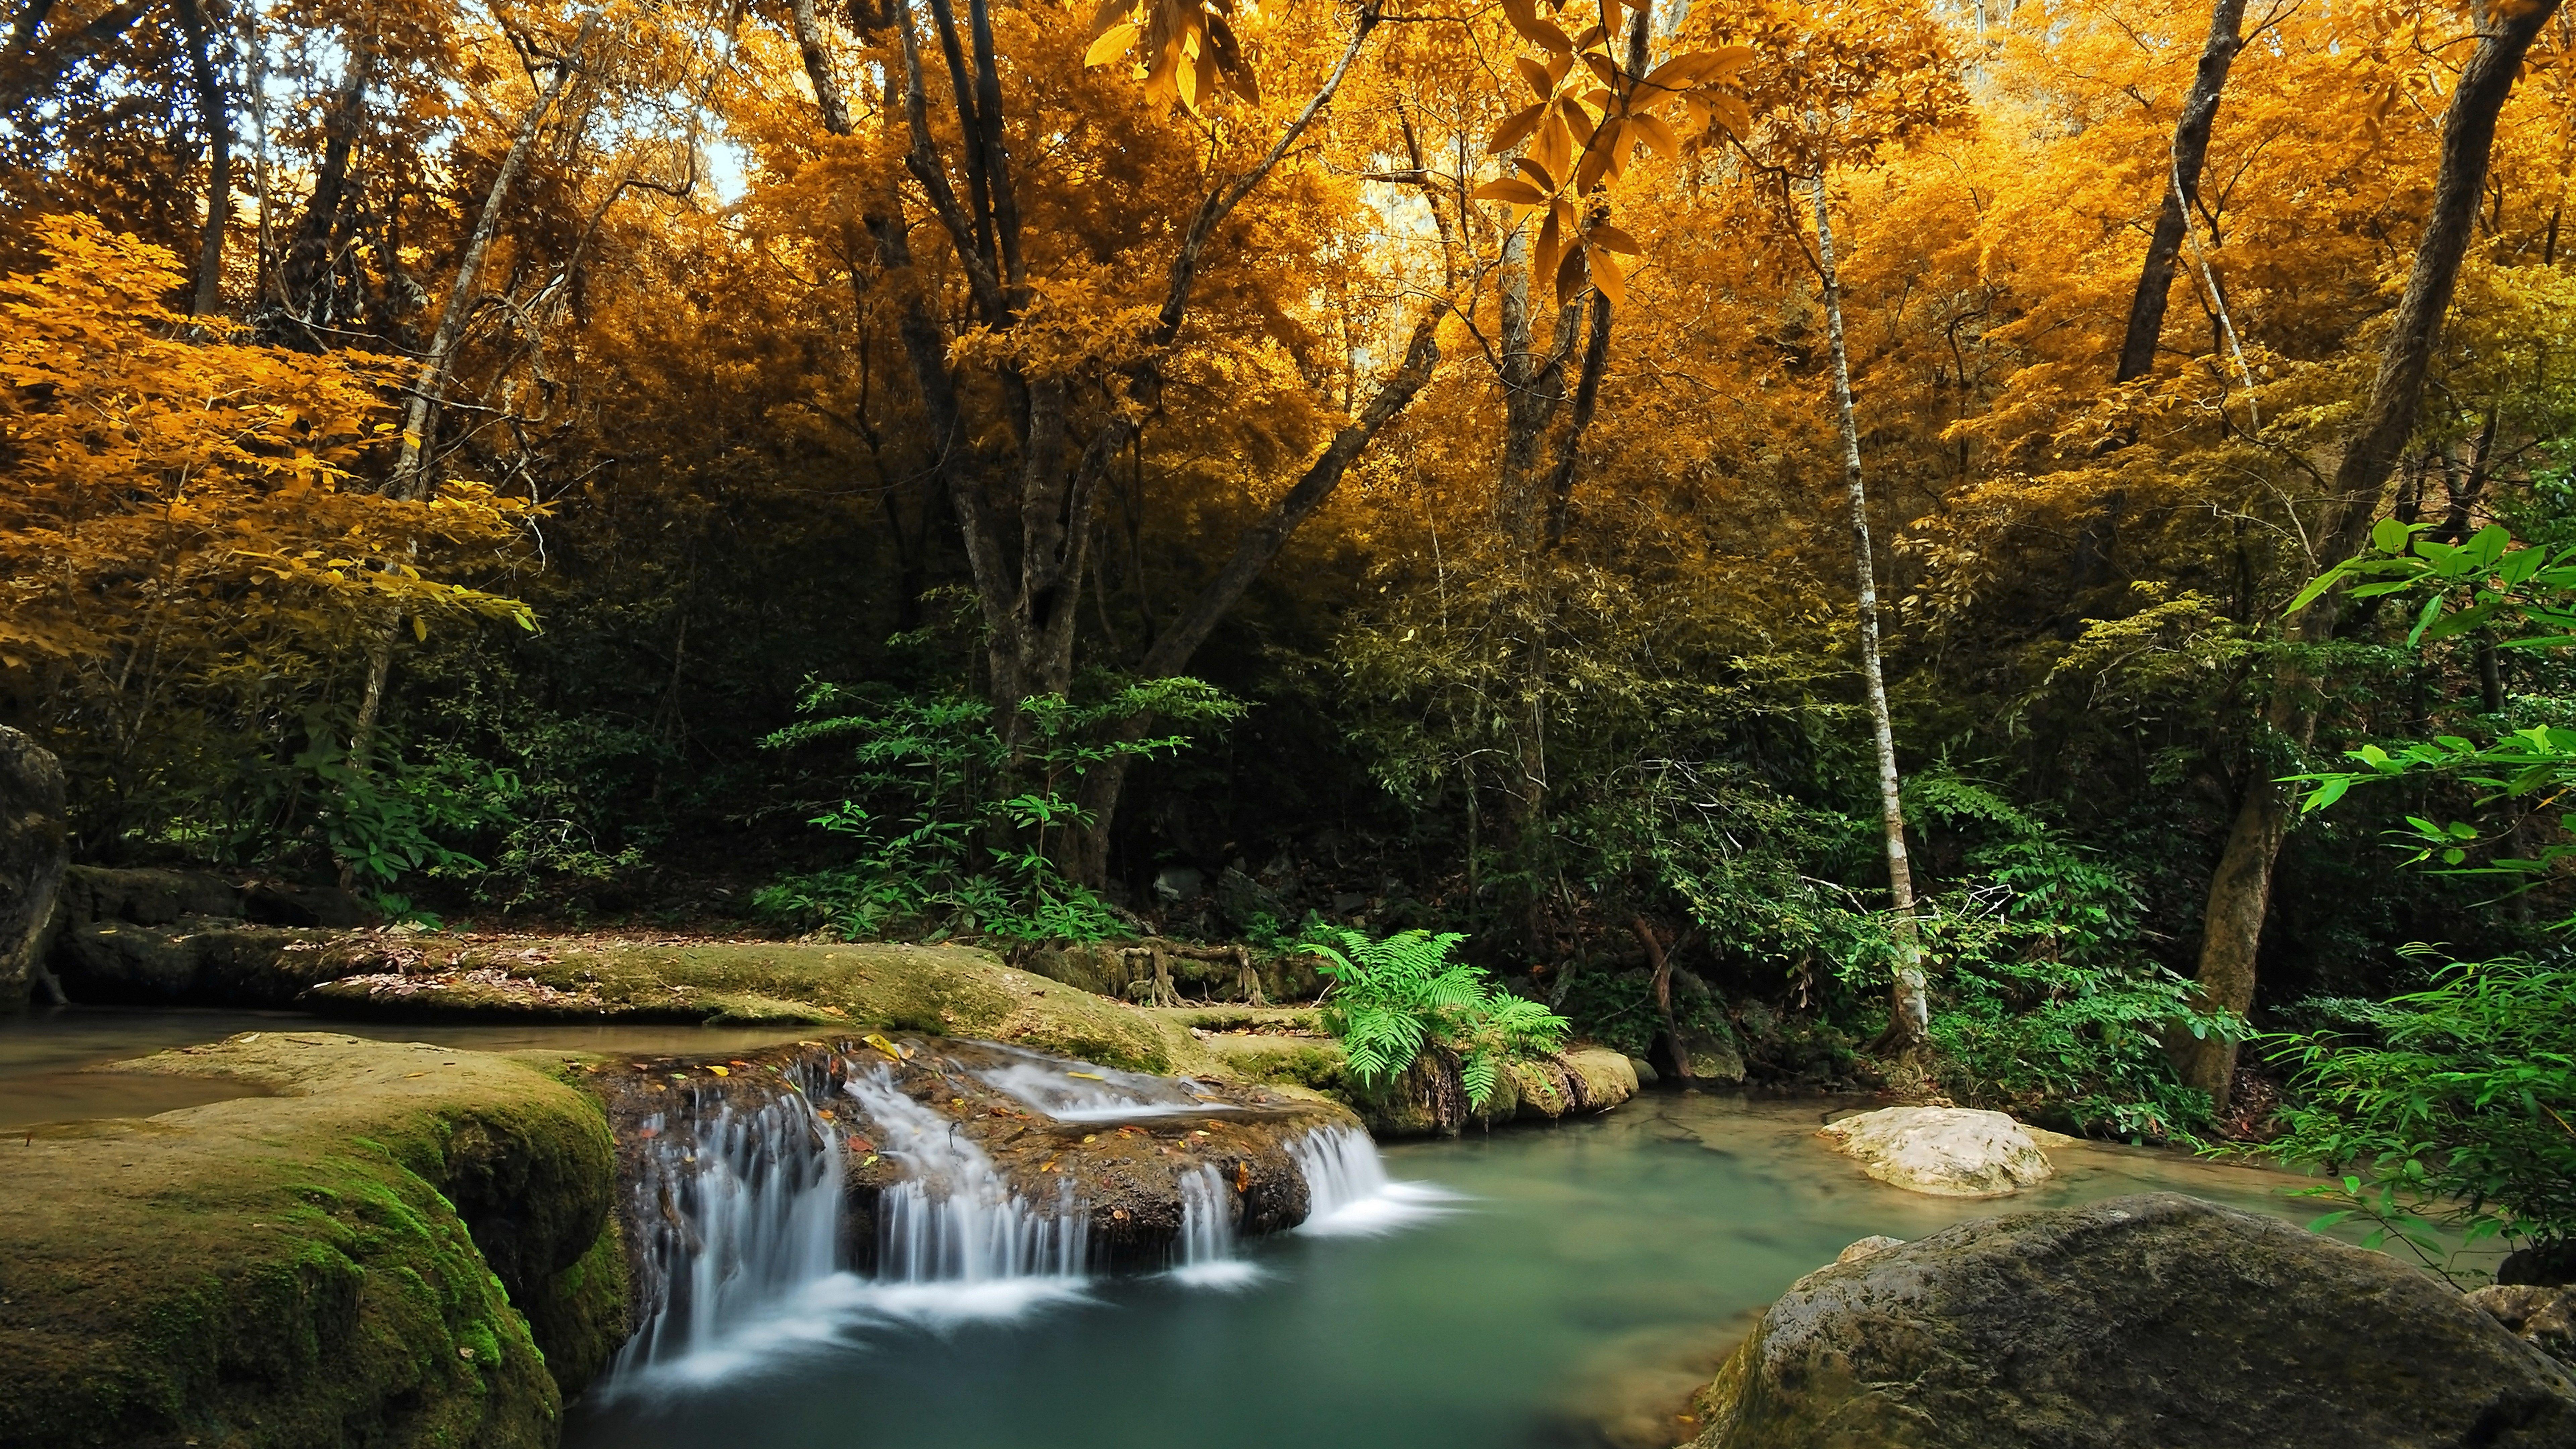 8k wallpaper nature inspired ololoshenka waterfall - Nature wallpaper 8k ...